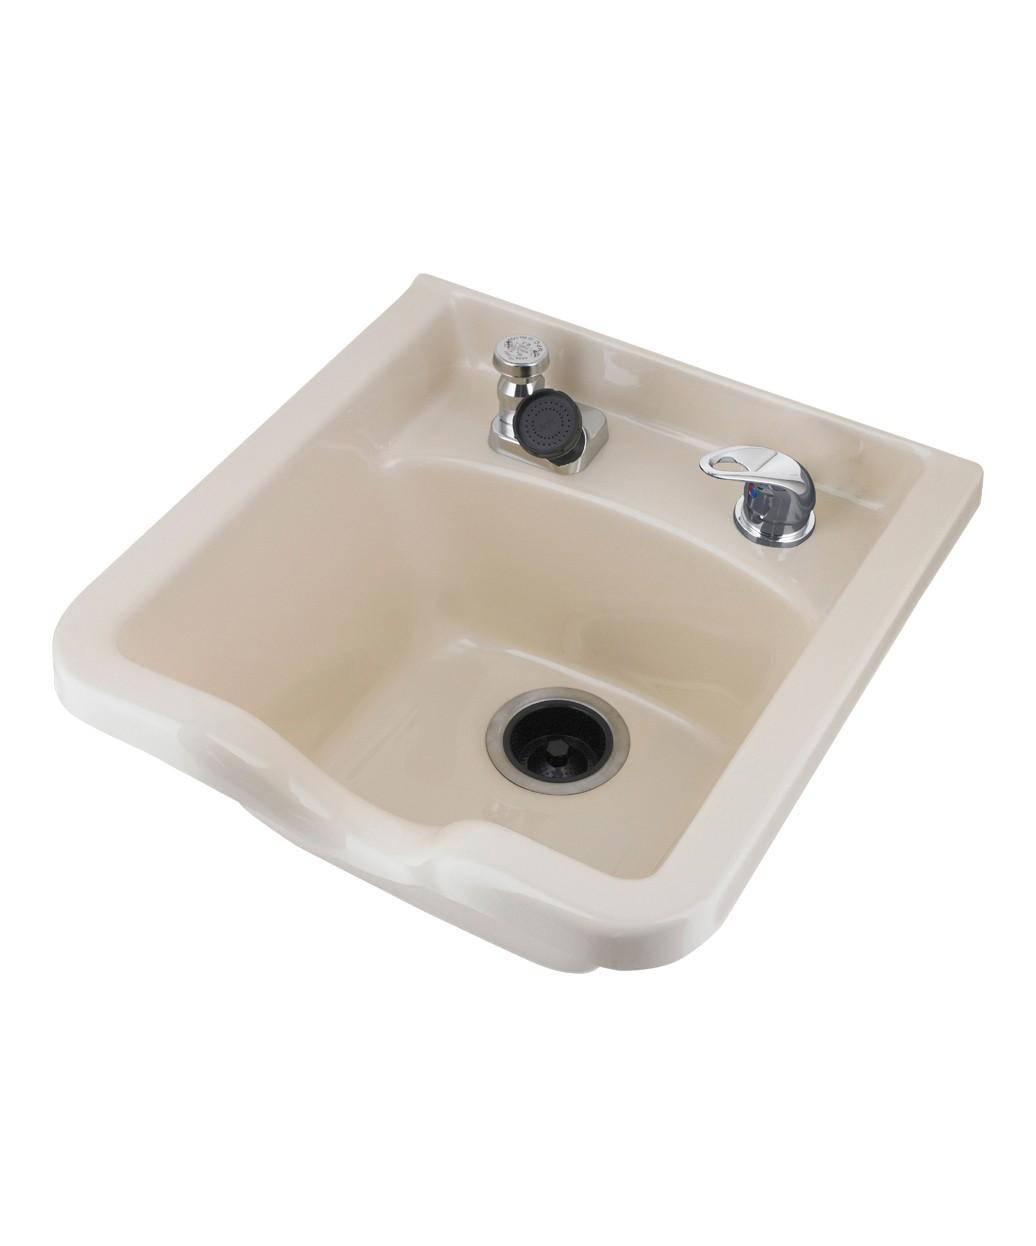 Marble Products #10 Fiberglass Shampoo Bowl